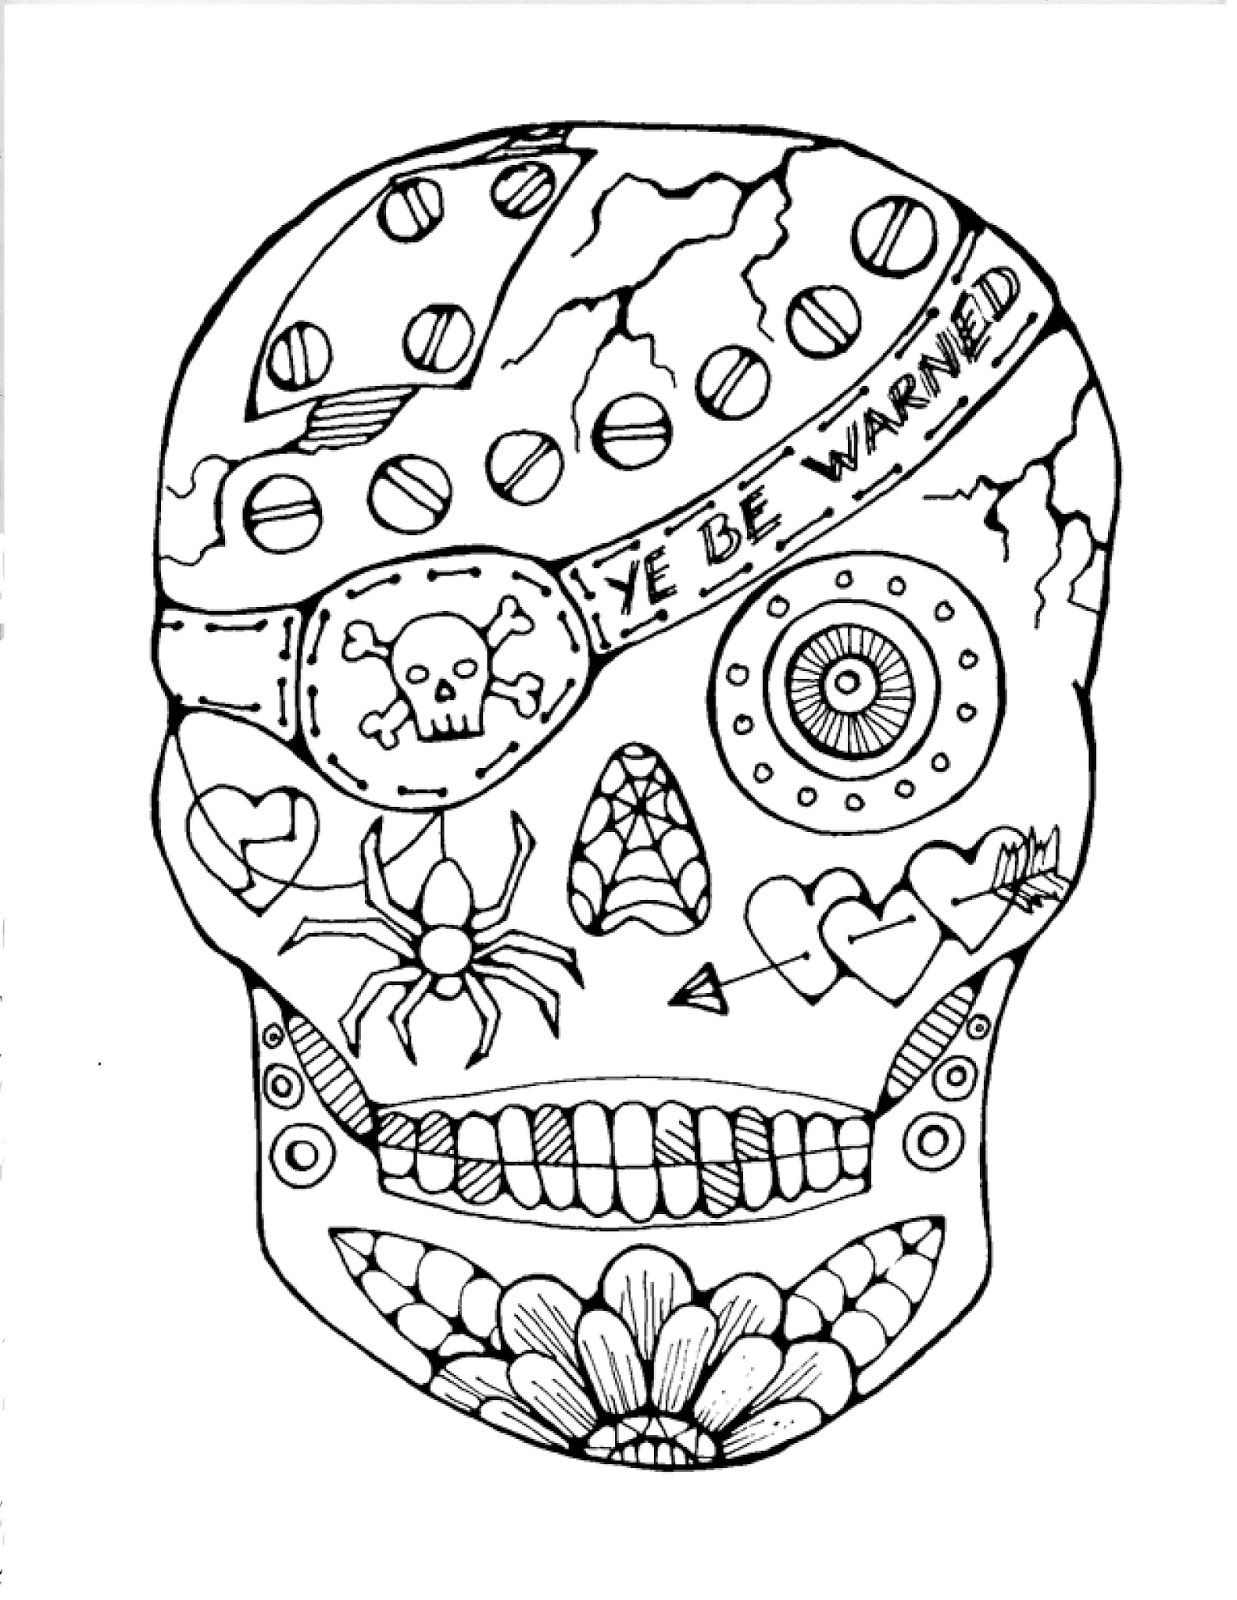 coloring pages skull sugar skull coloring page free printable coloring pages coloring pages skull